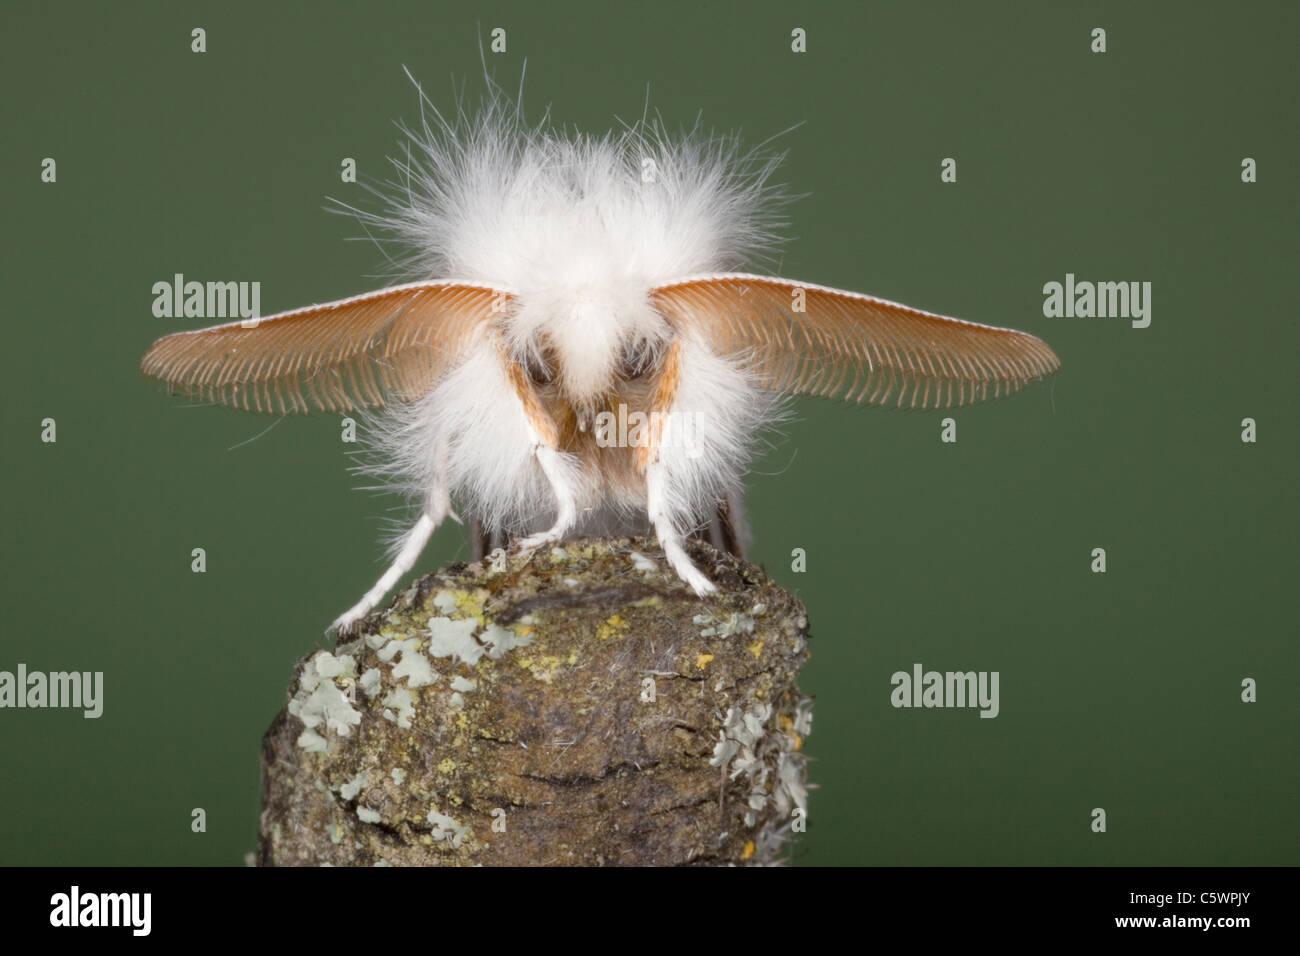 Brown-tail Moth - male showing antennae Pest species larvae causes urticae Euproctis chrysorrhoea Essex, UK IN000956 - Stock Image